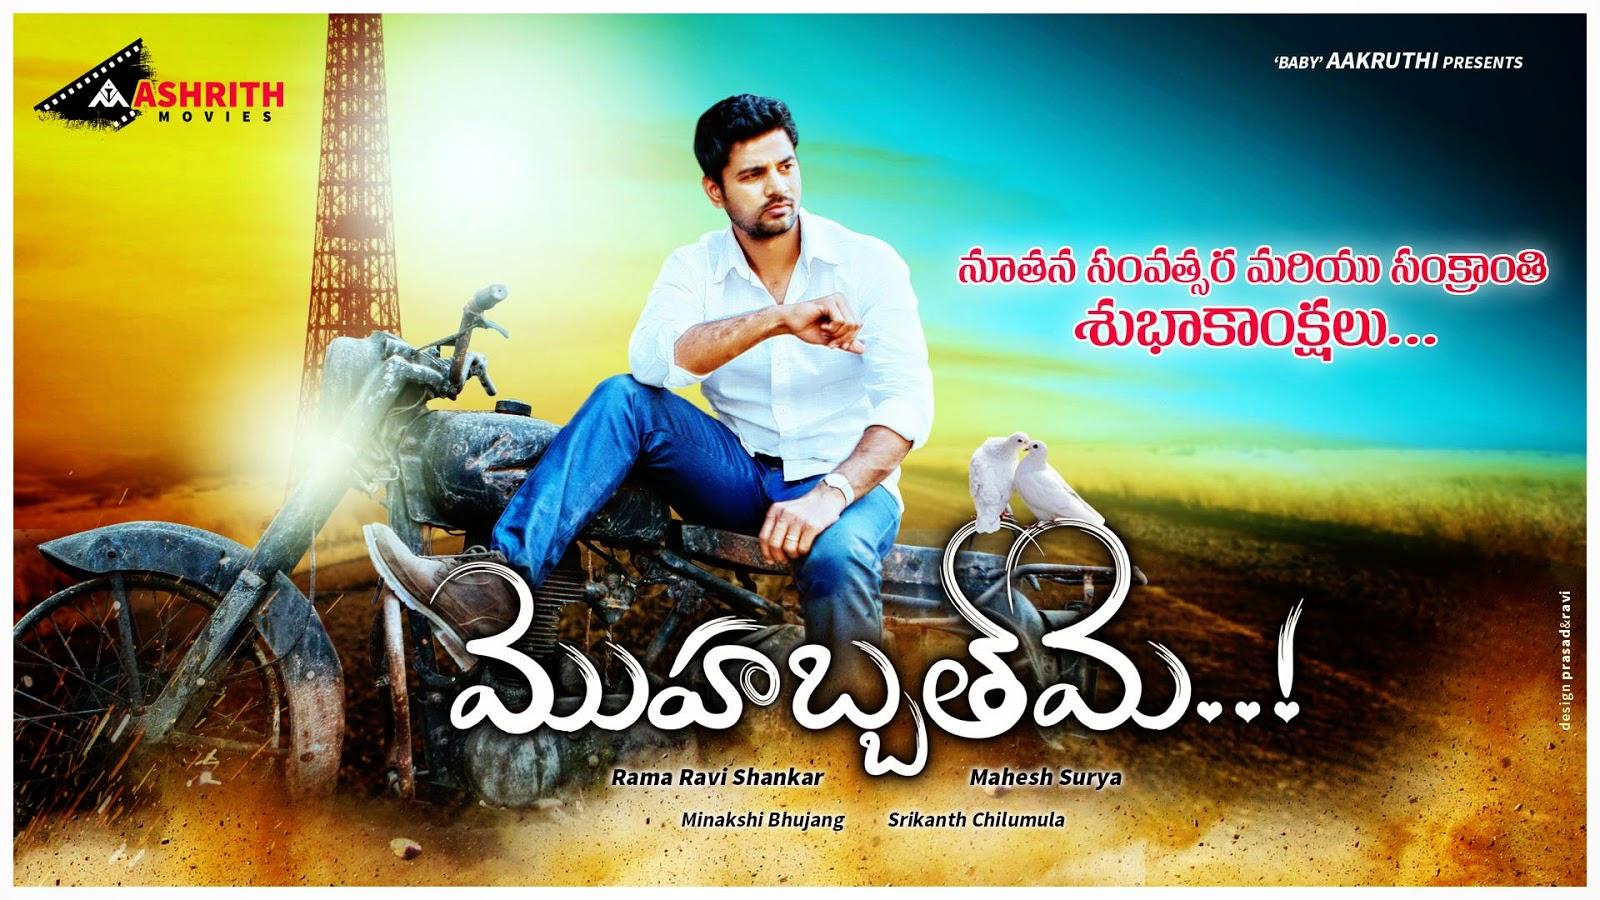 sankranthi telugu movie ringtones free download - wild child watch